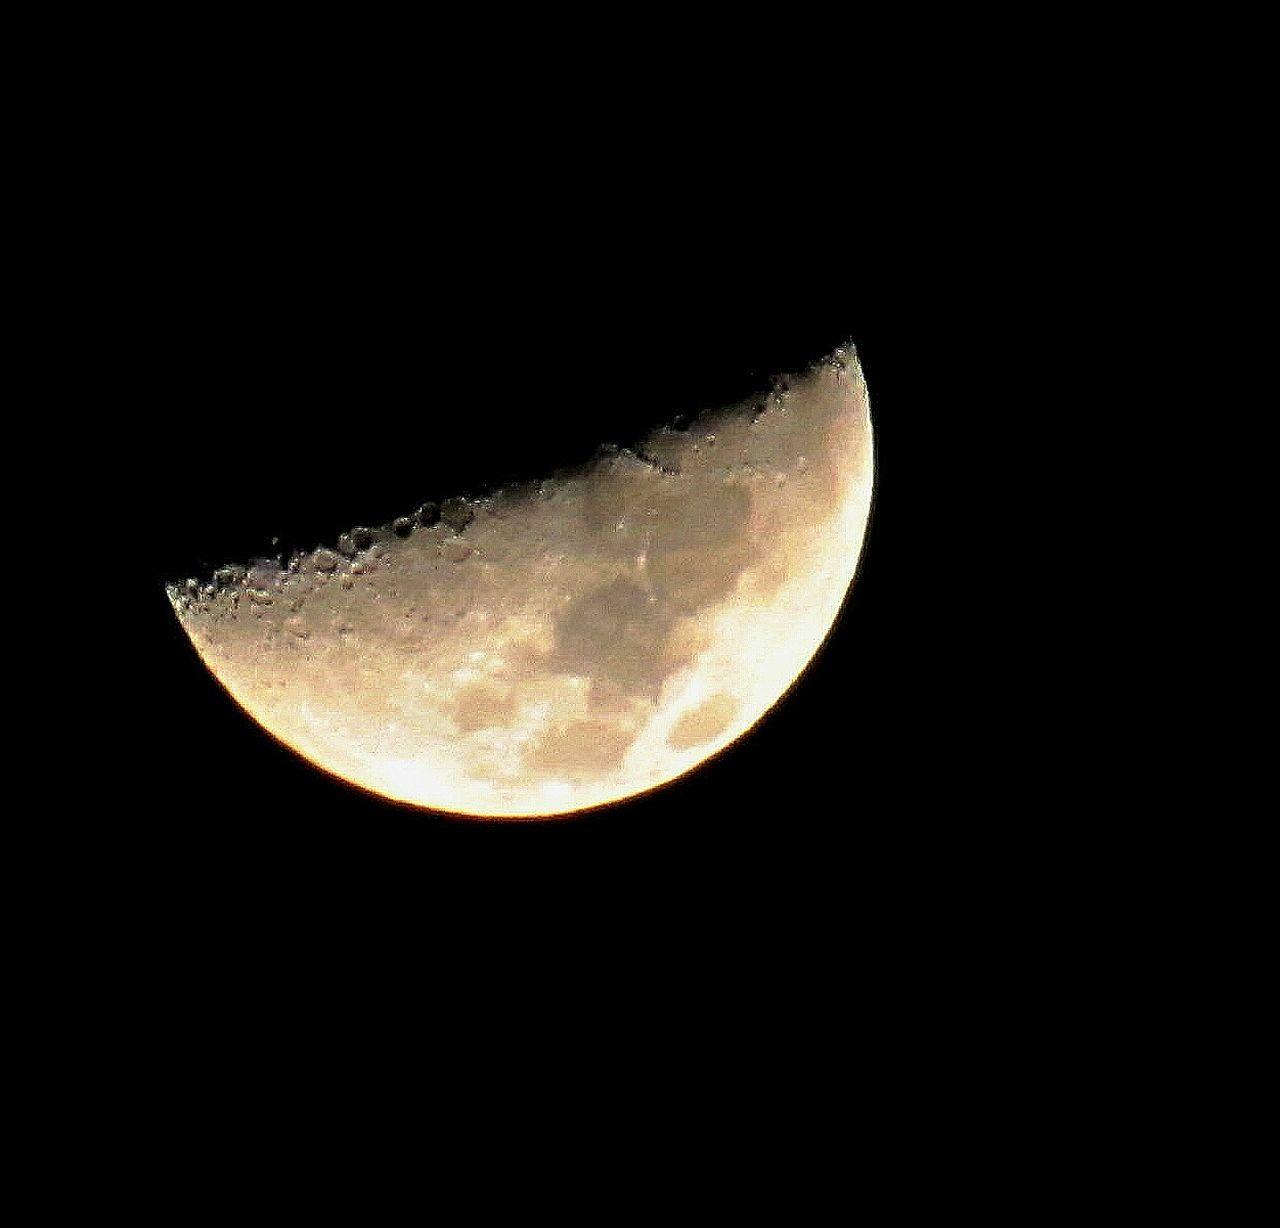 December moon (Dec 6,2016 to be exact) Astronomy Night Moon Black Background Half Moon Moon Surface EyeEm EyeEm Best Shots Getting Inspired